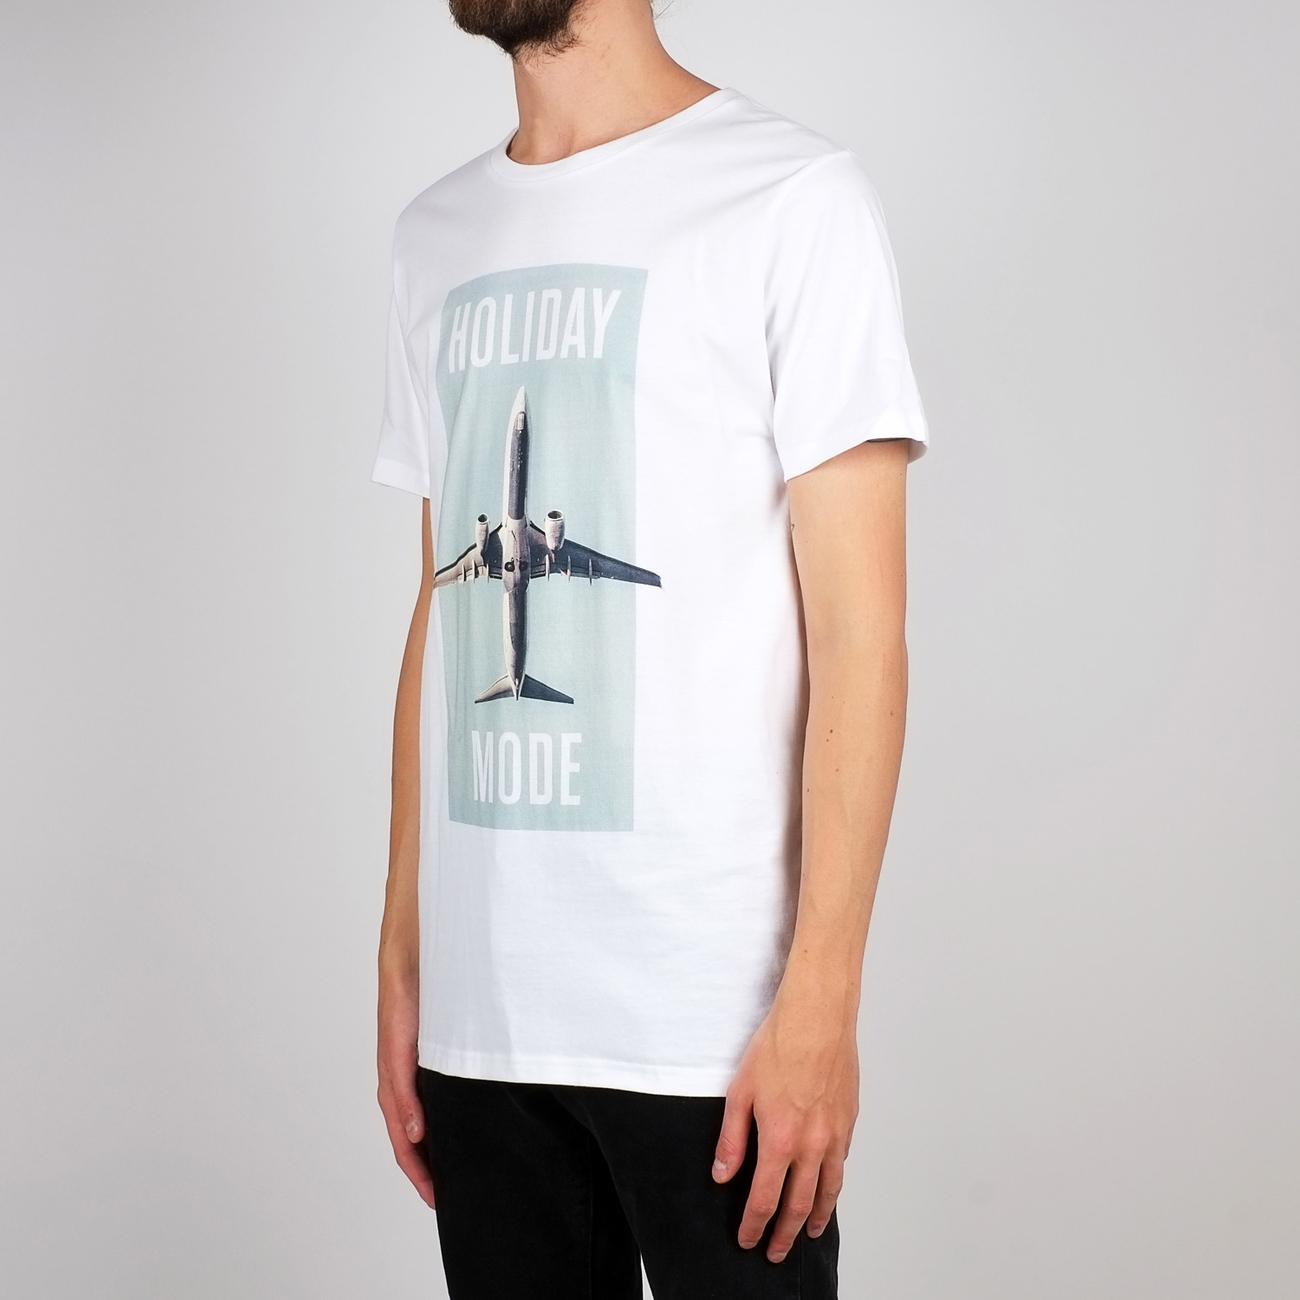 T-shirt Stockholm Holiday Mode